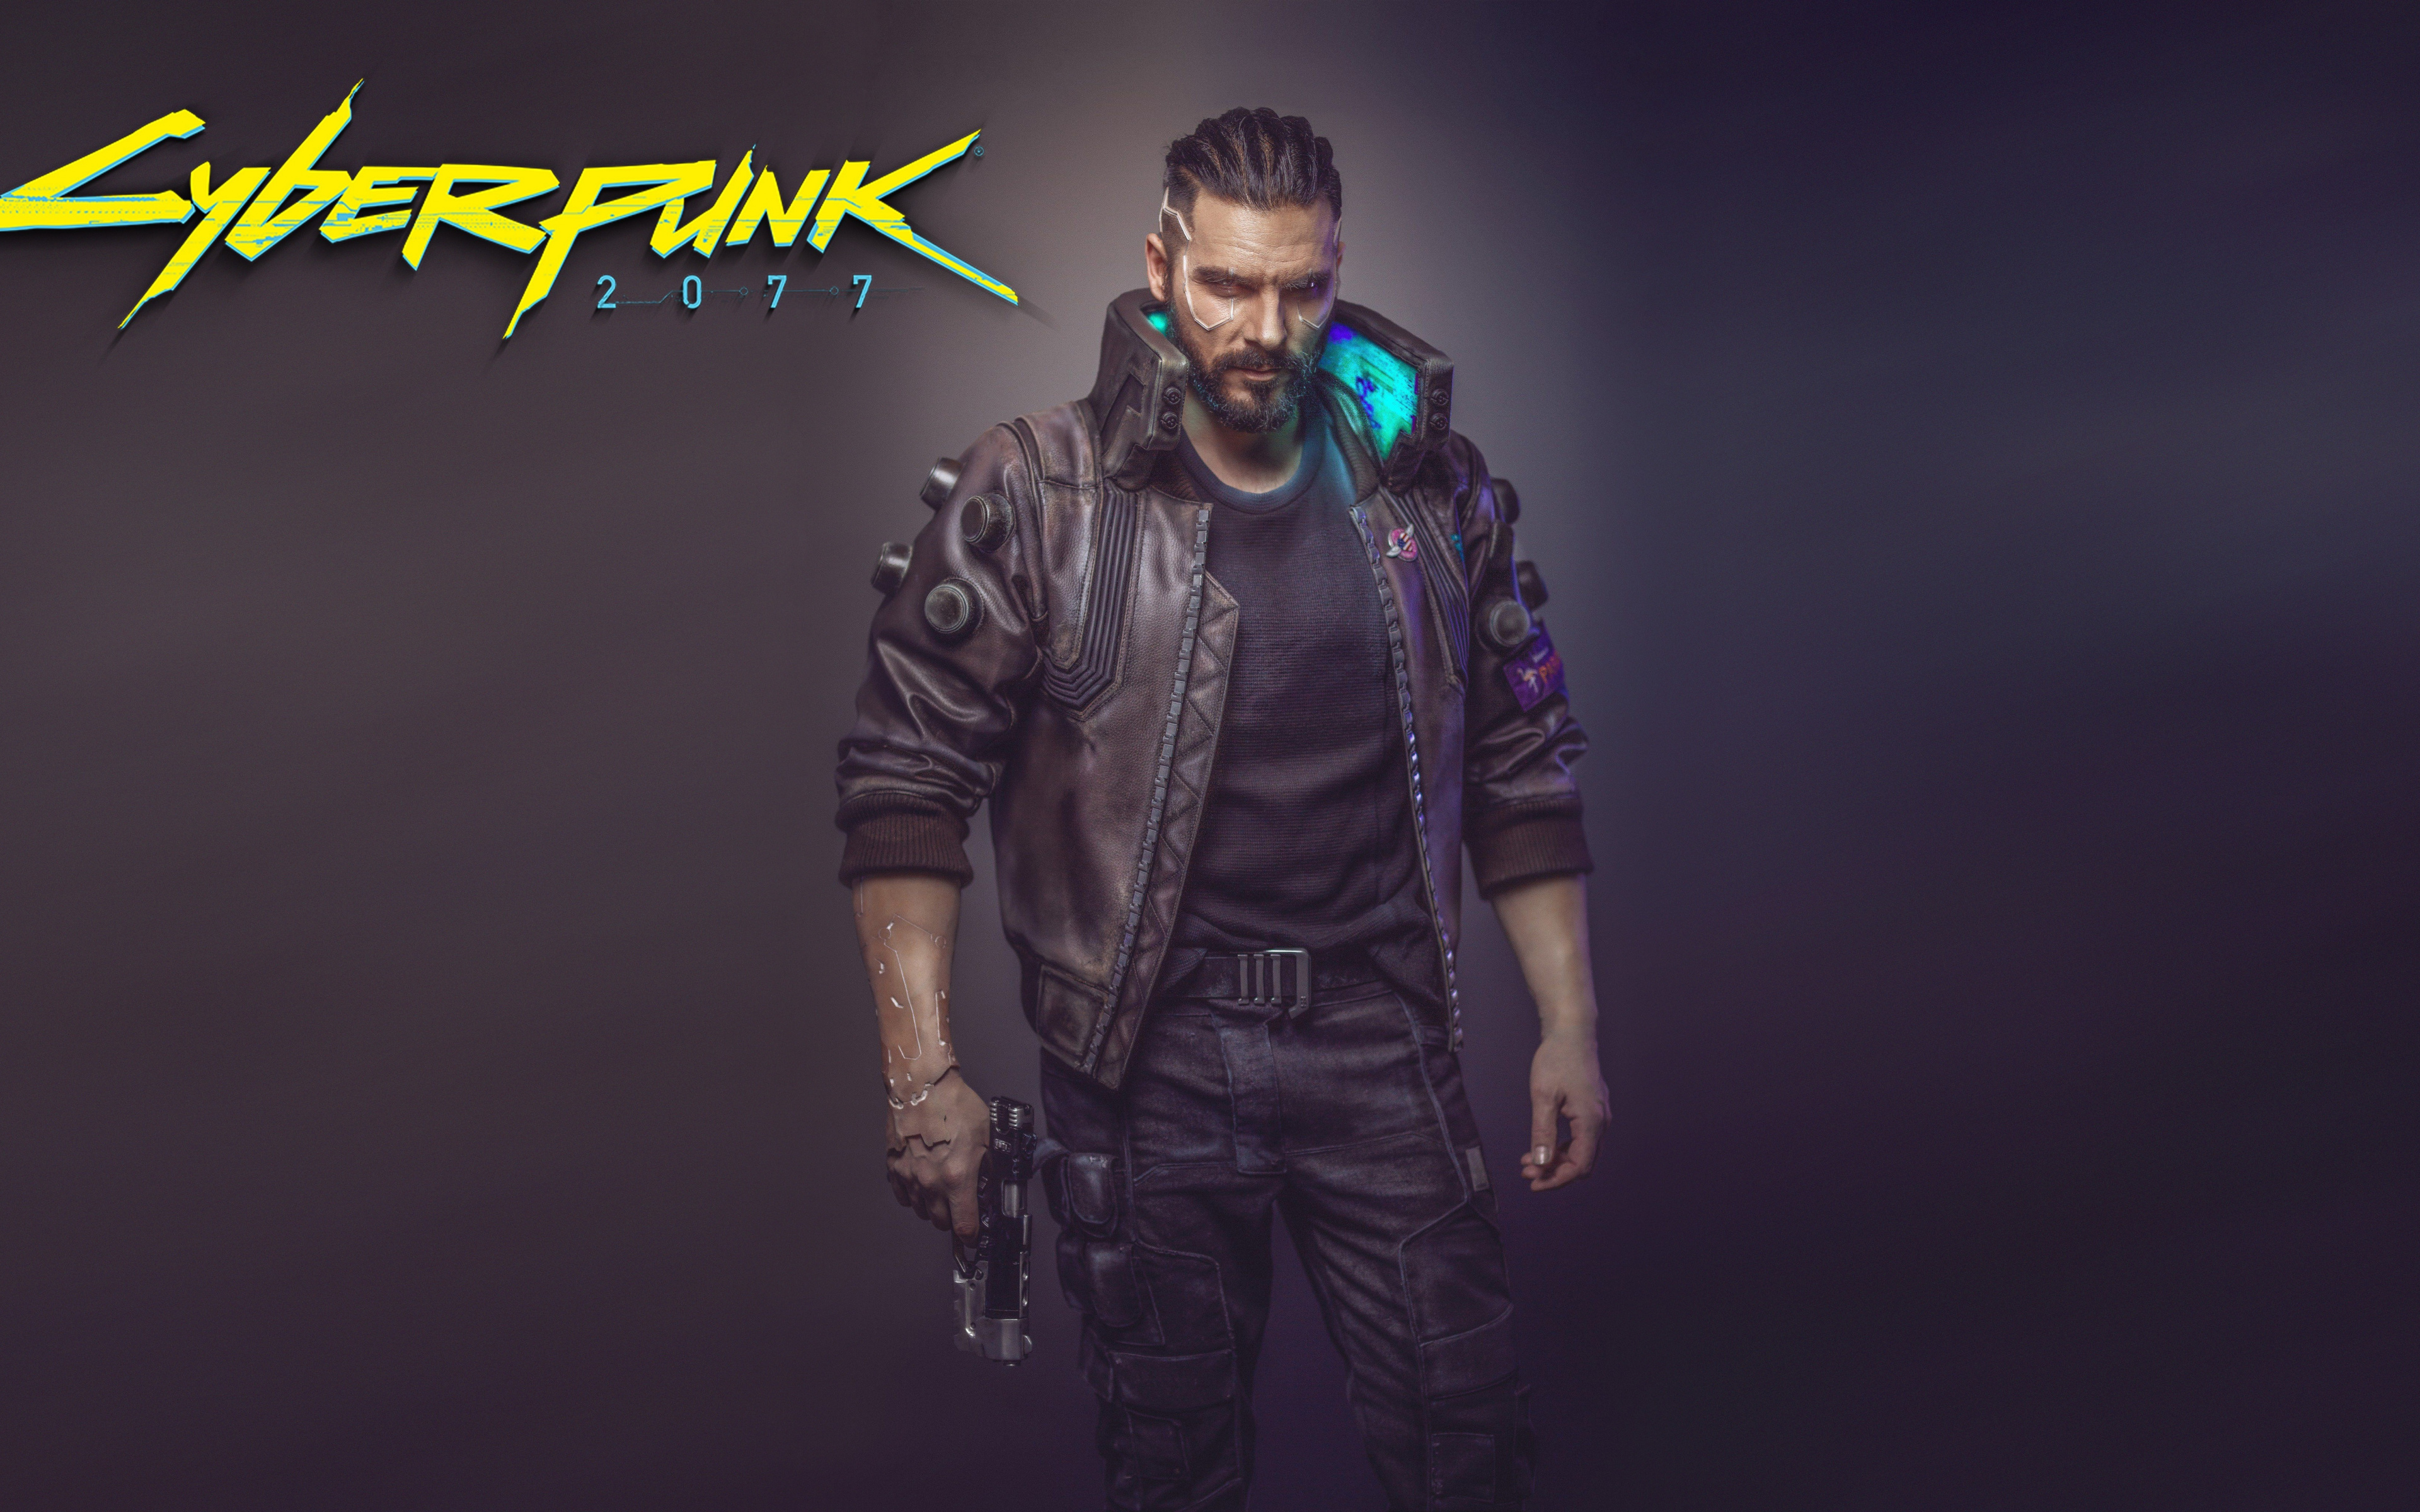 cyberpunk 2077 man with gun 2018